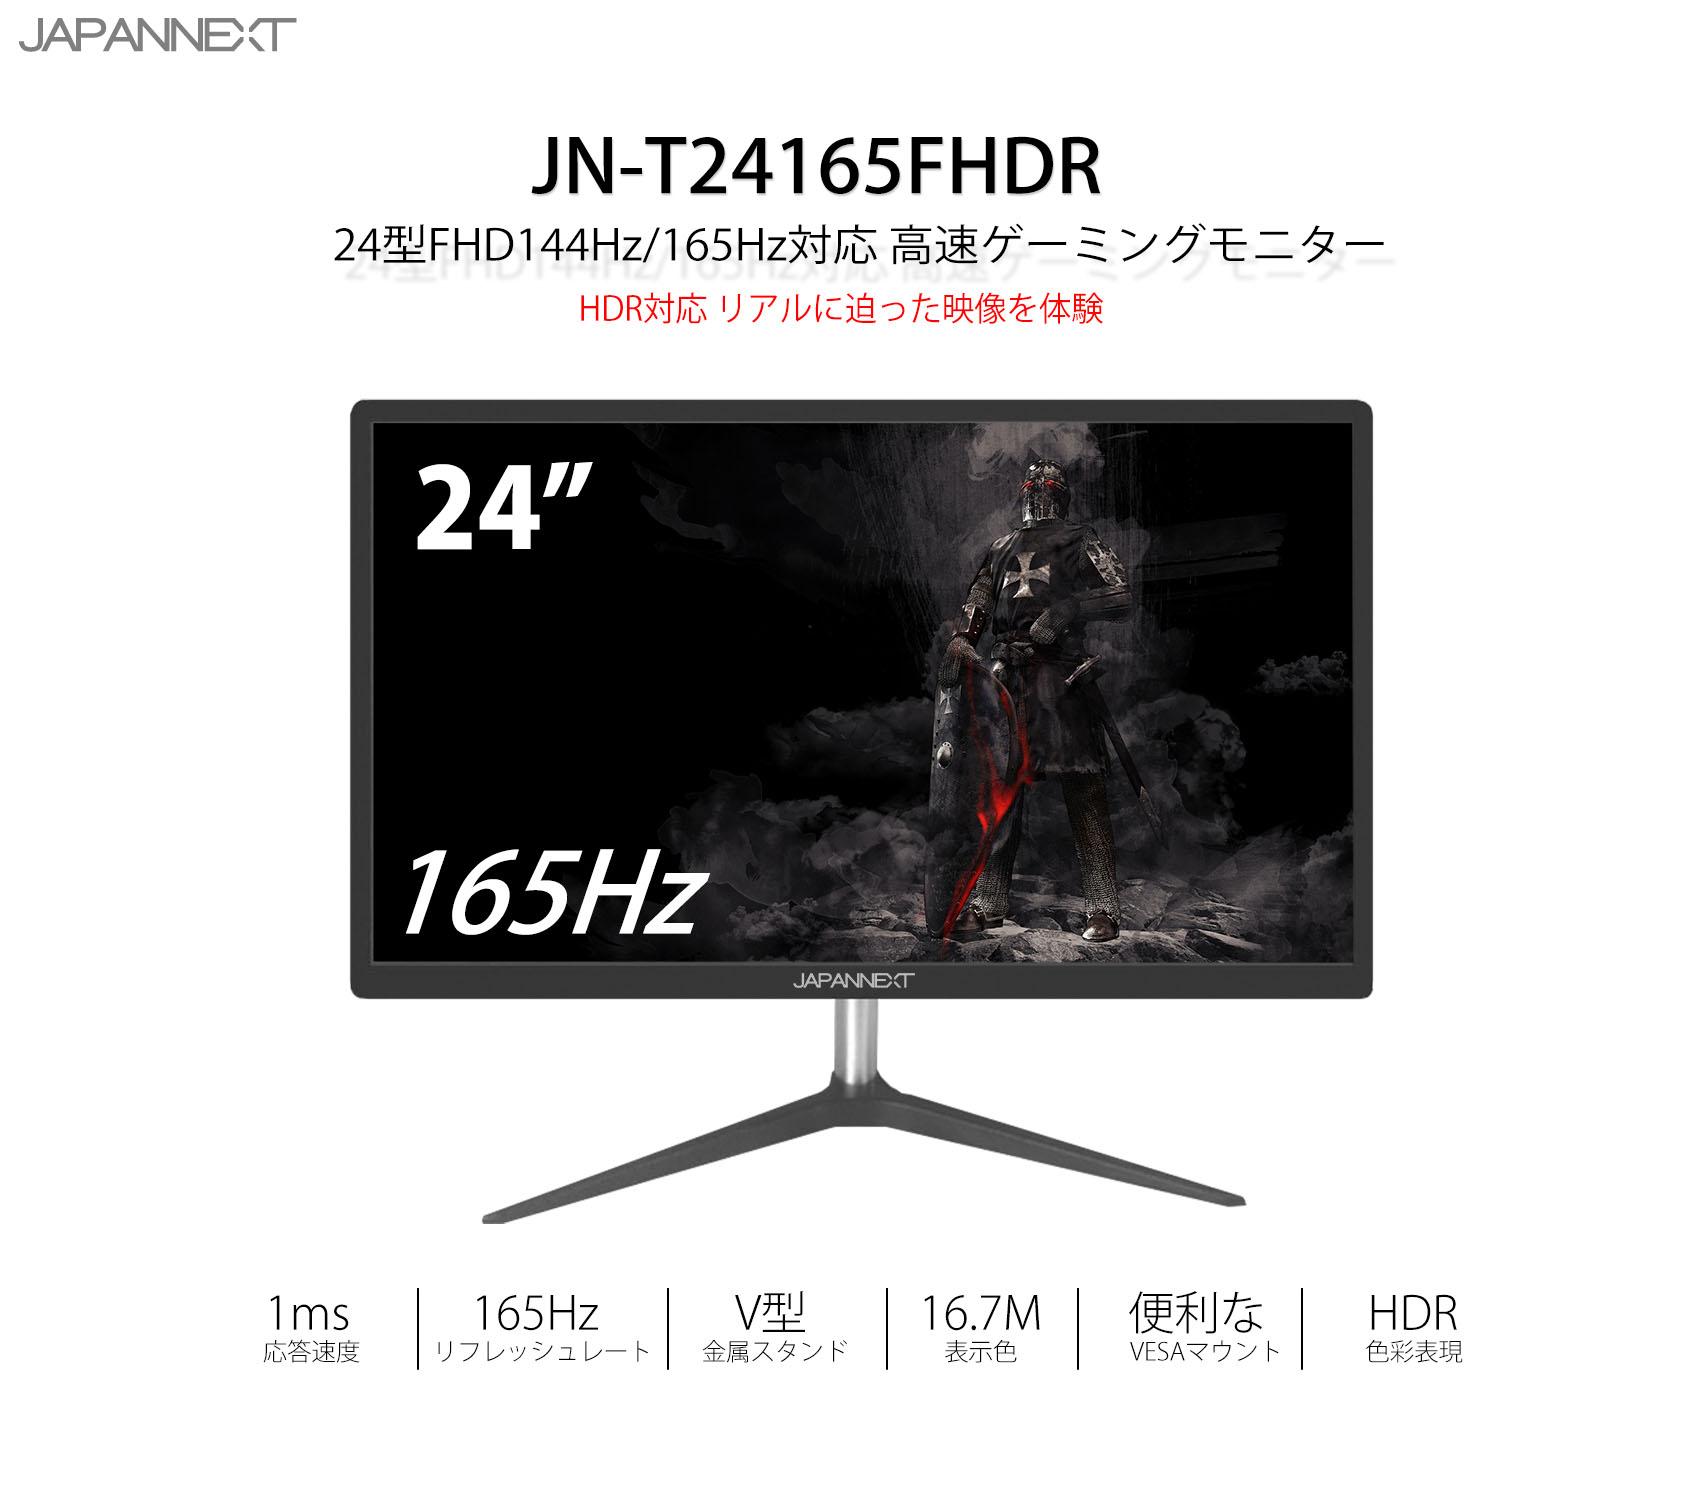 JN-T2820UHD-S specs